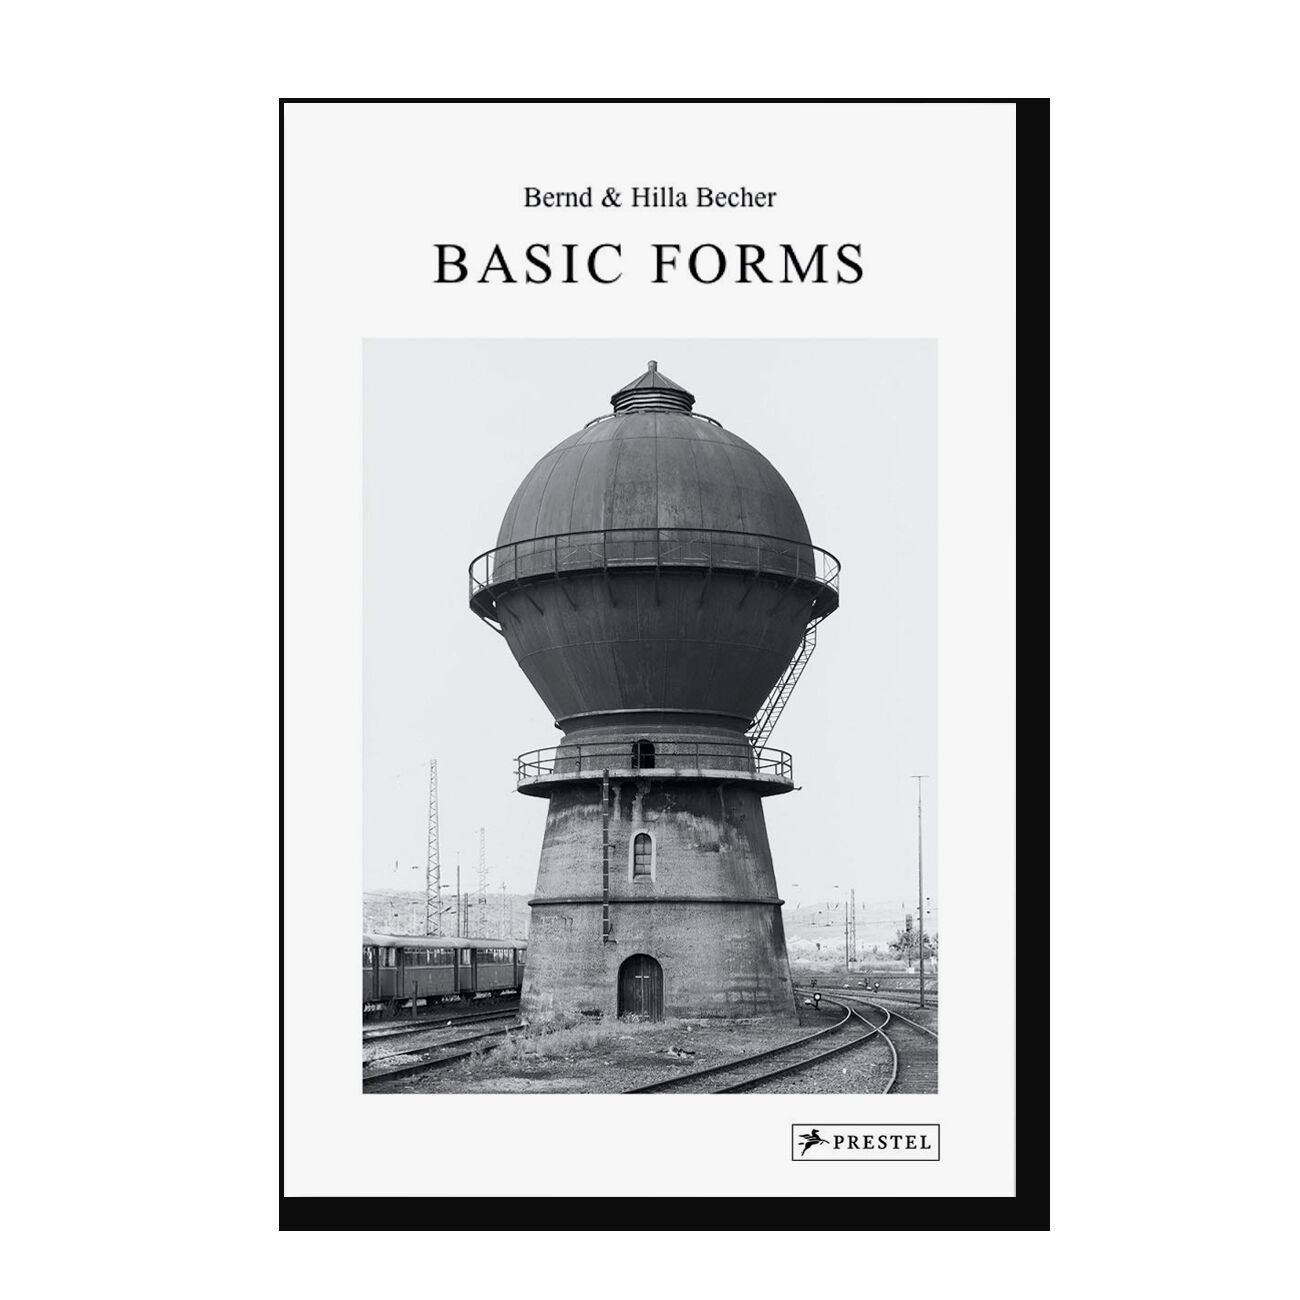 Bernd and Hilla Becher: Basic Forms